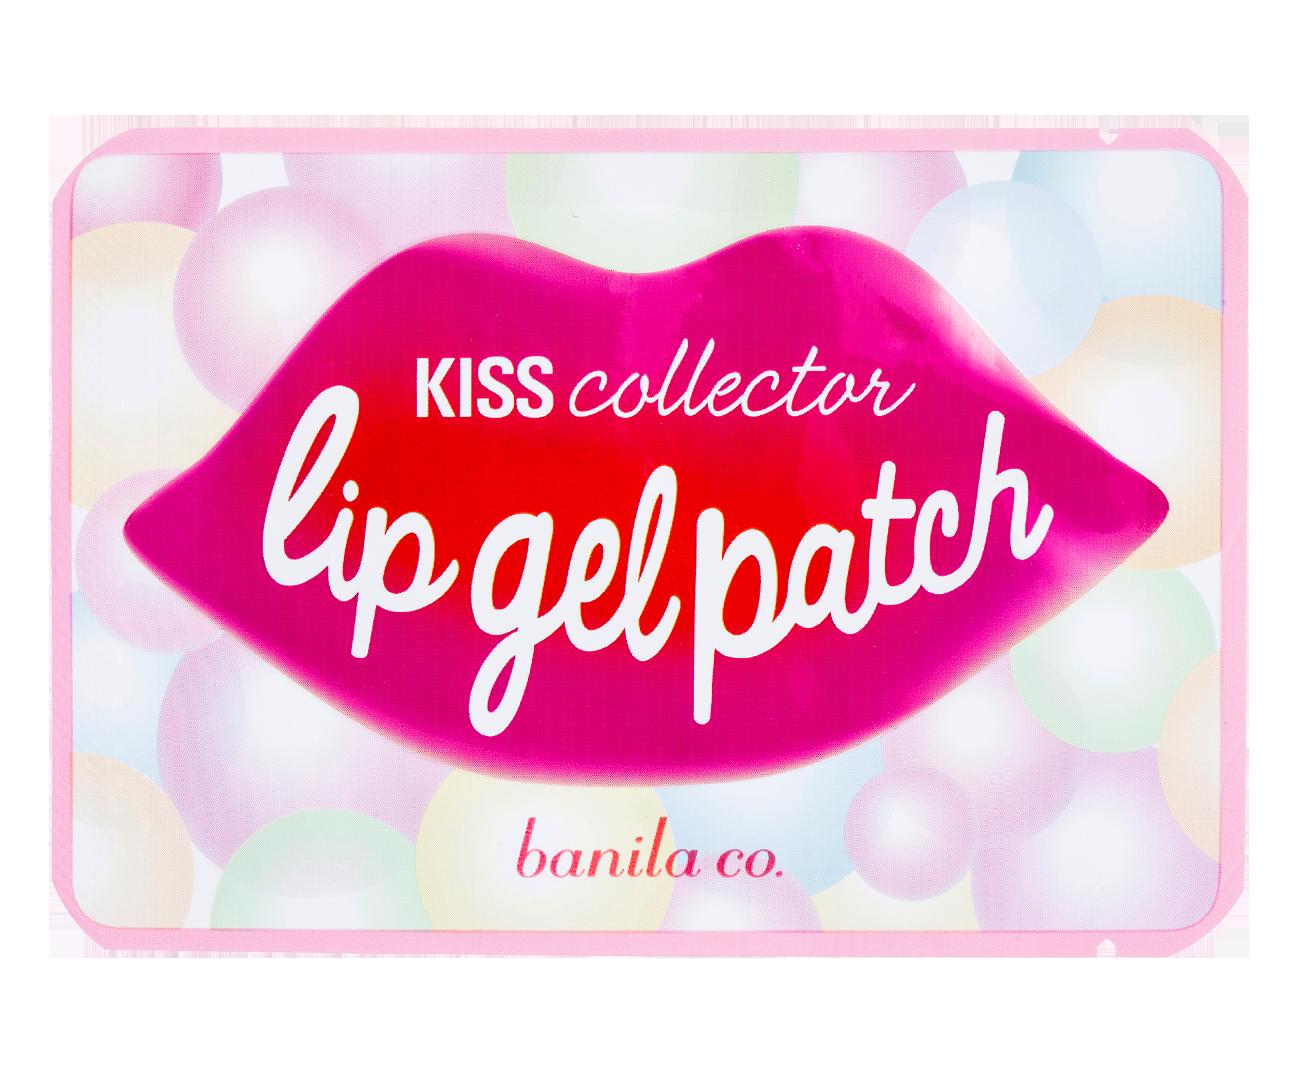 Banila Co. Kiss Collector Lip Gel Patch